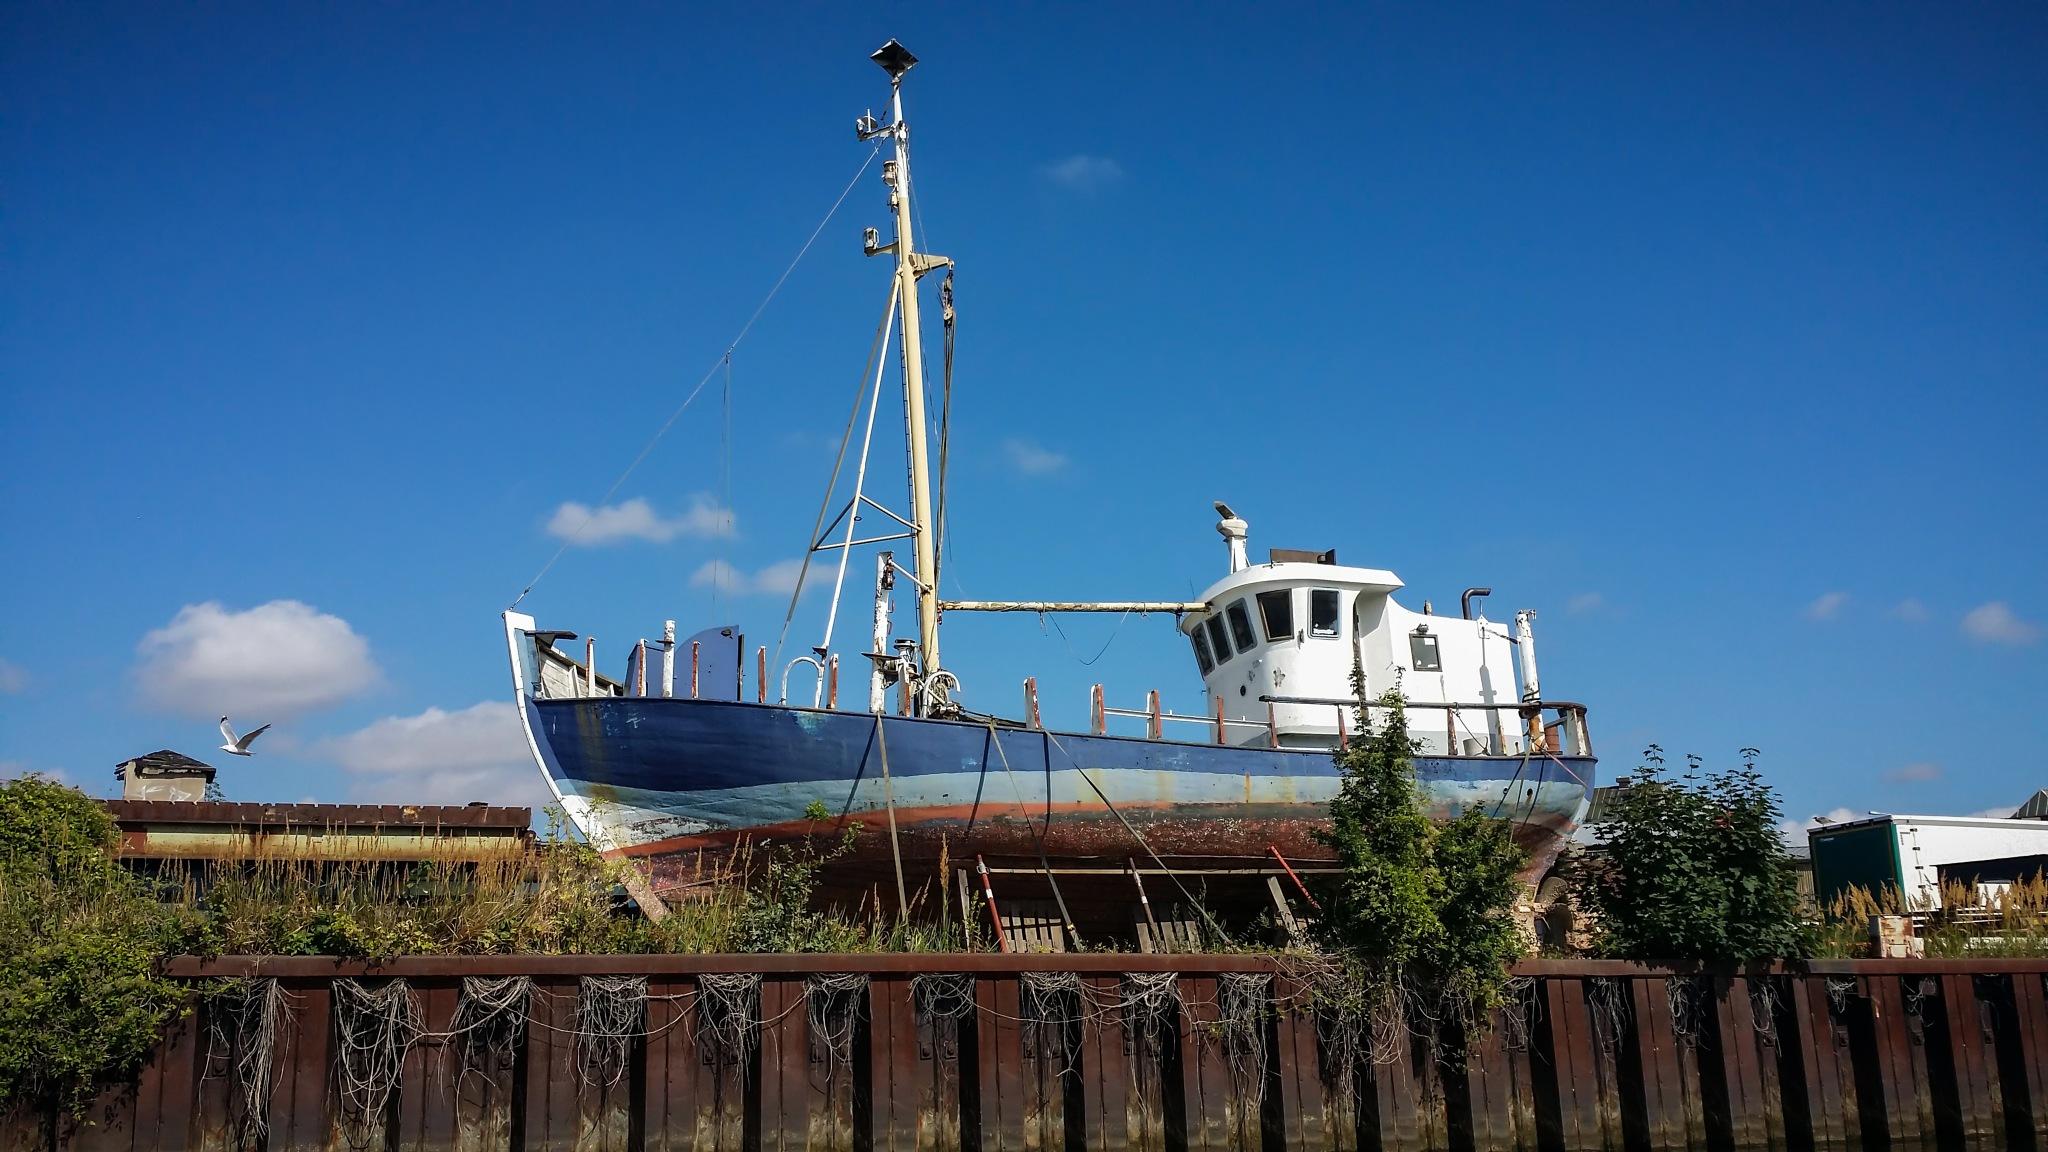 Old scrapped ship by FoTorsten